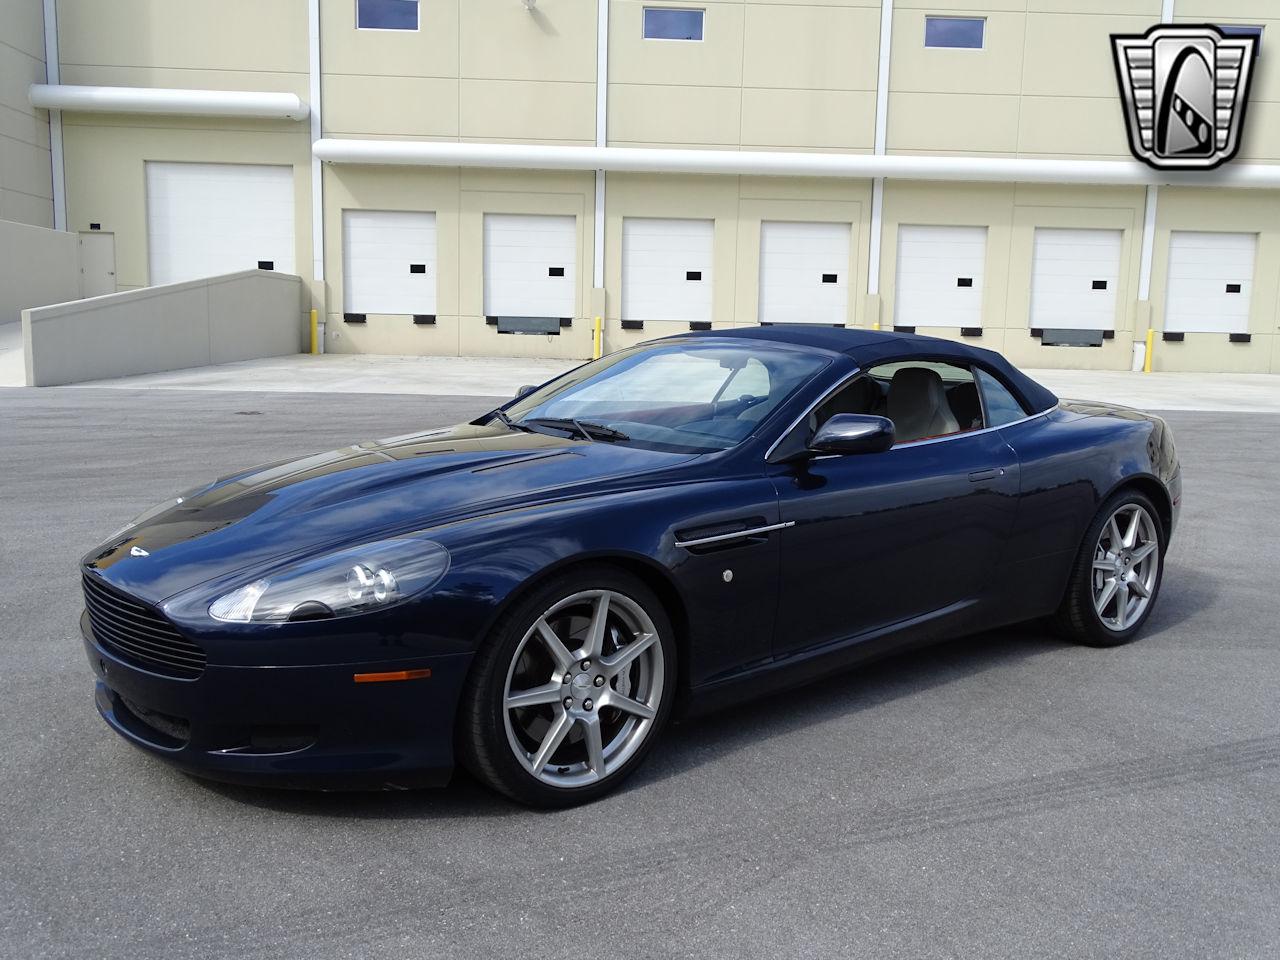 2006 Aston Martin DB9 60